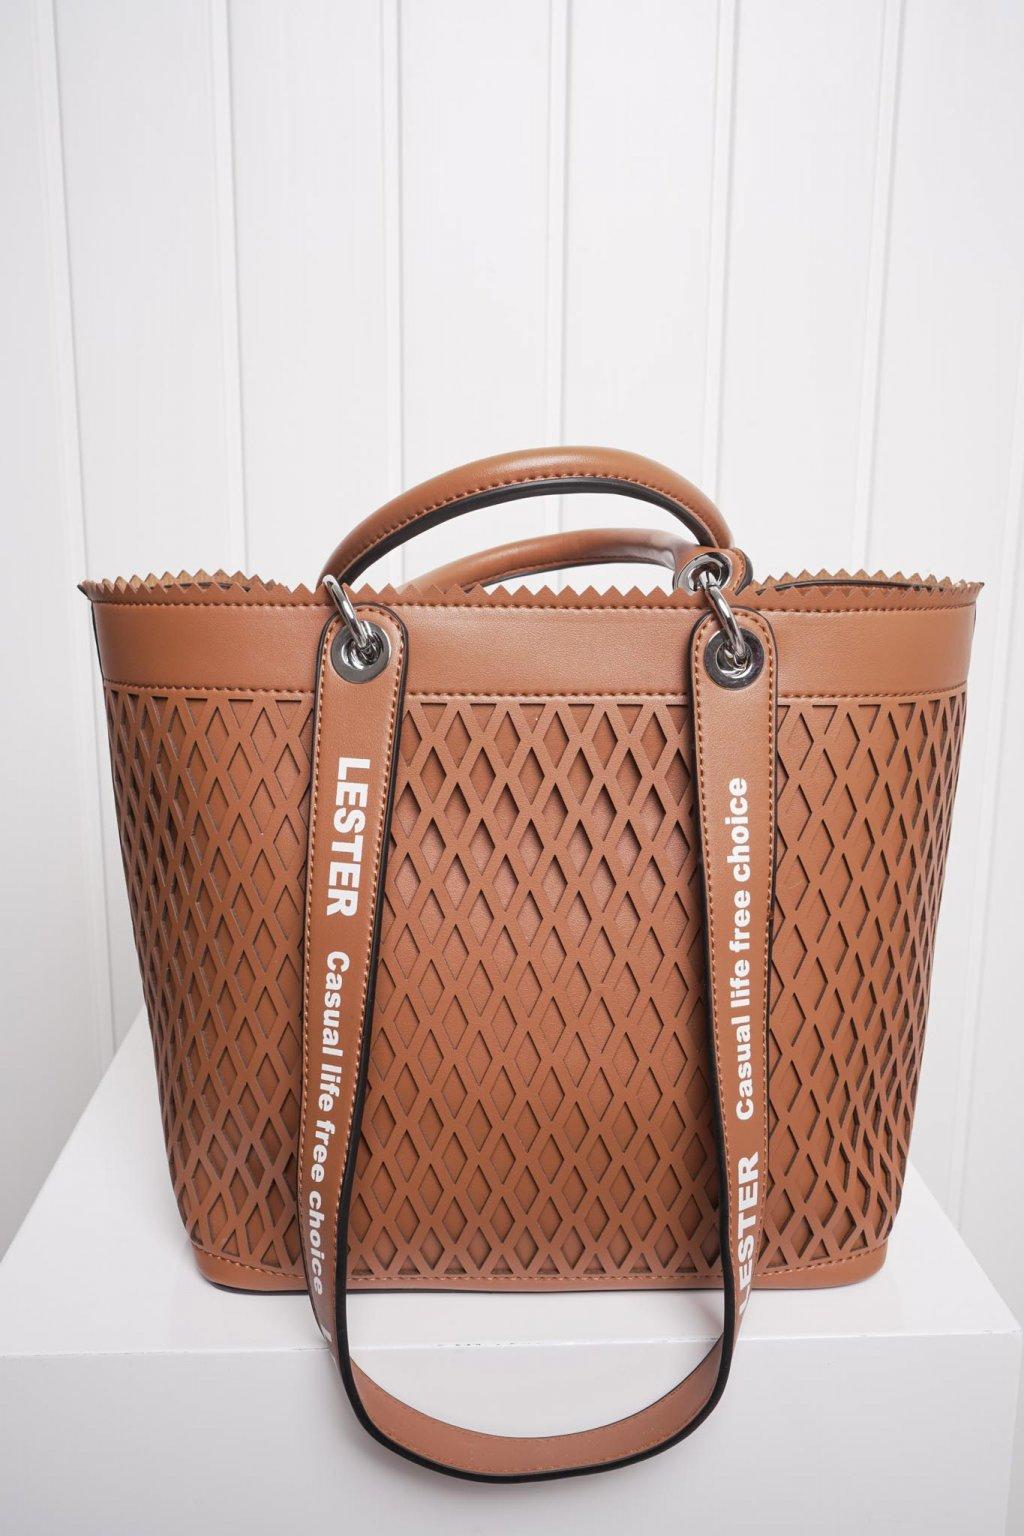 Kabelka, ruksak, dobrá cena, čierna kabelka, čierny ruksak, basic, kabelky, ruksaky 042